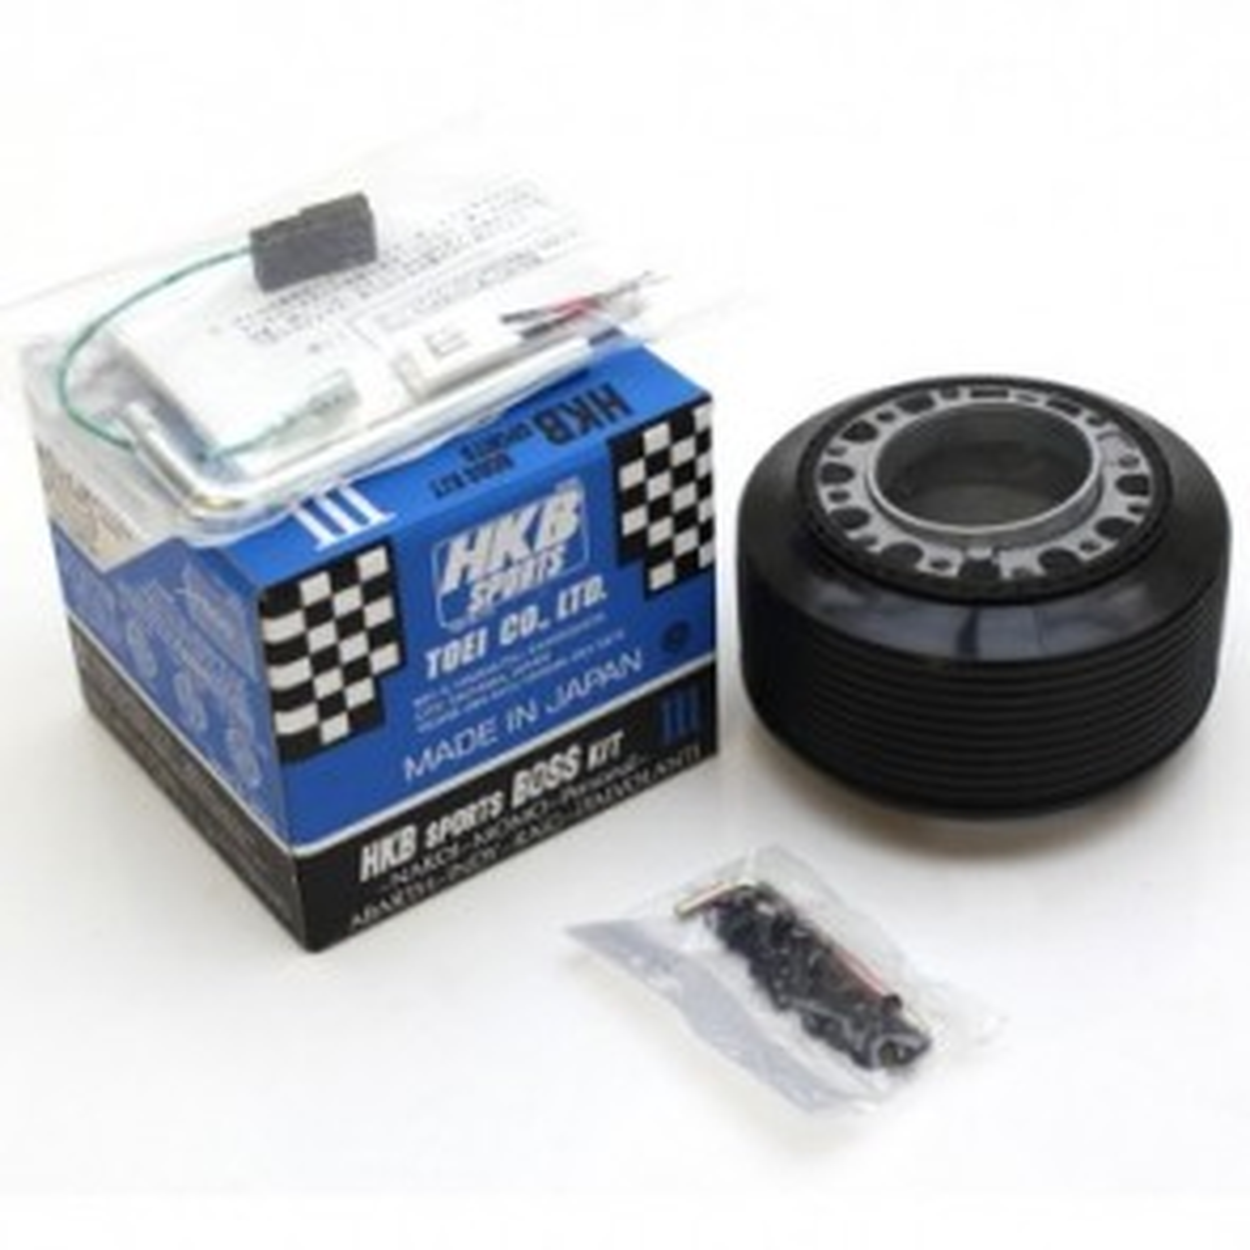 HKB Steering Wheel Boss Kit for Subaru Impreza Classic GC8 (non-Air Bag) - OS-103